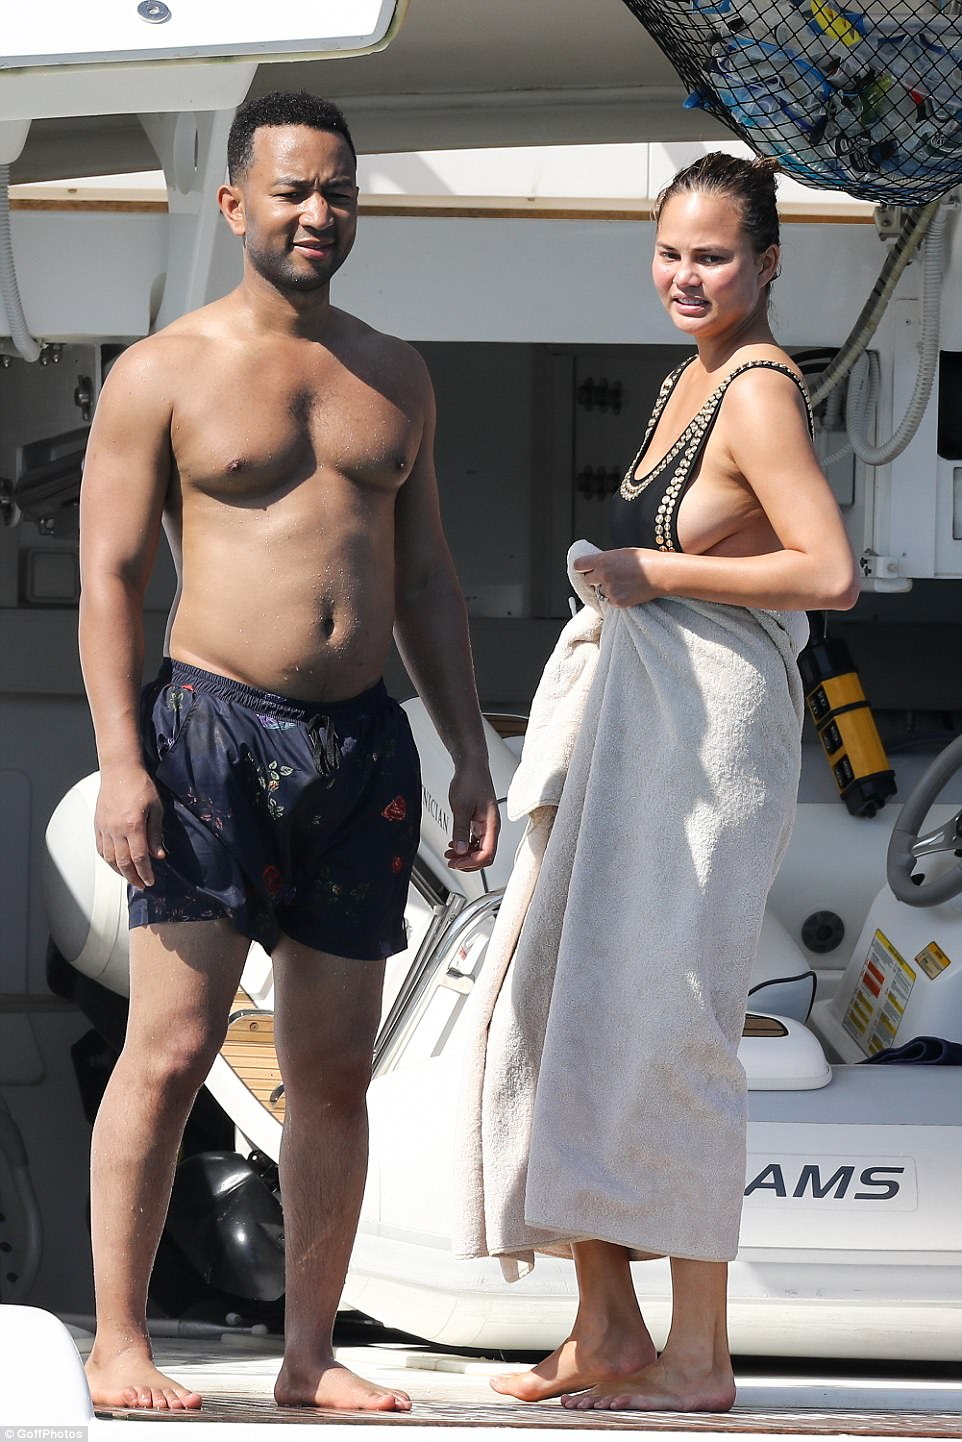 Amanda lear see through 27 Photos,Ivanka trump Porn clip Rita ora in swimsuit on a yacht in porto cervo,Maria Villalba Sexy